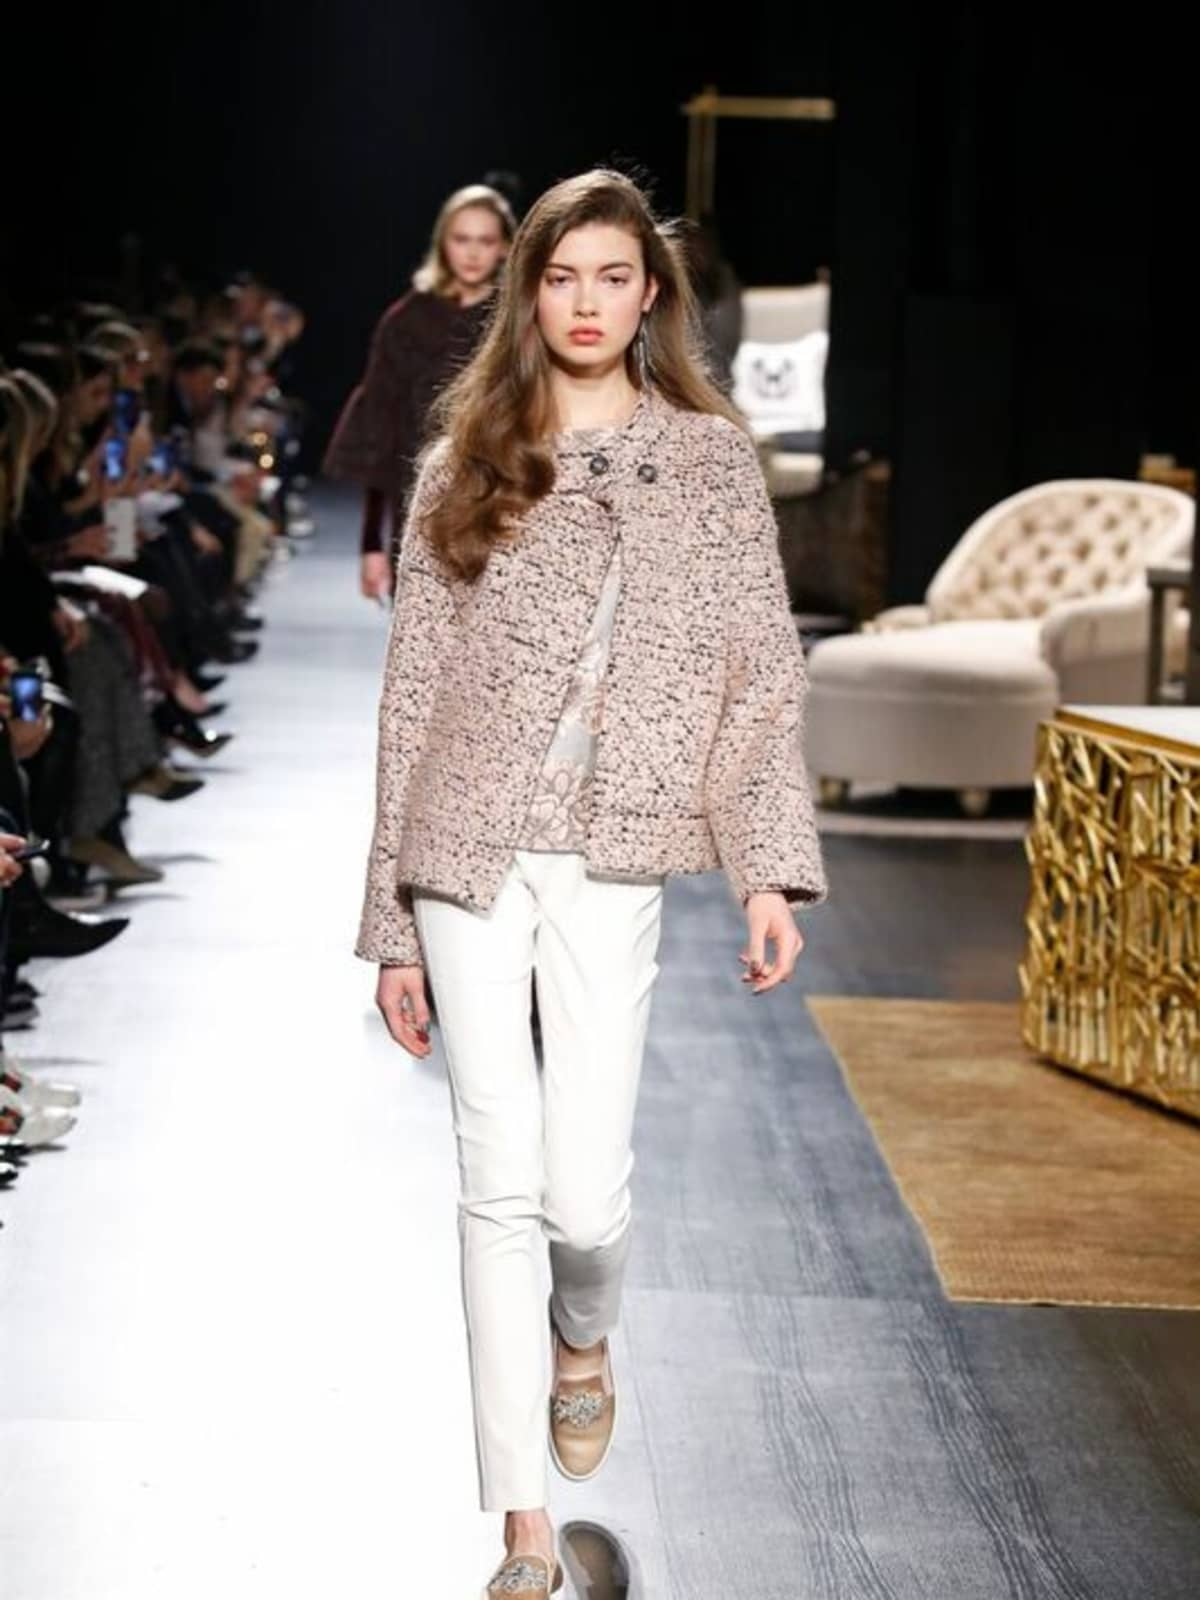 Badgley Mischka fall 2017 sportswear look 6